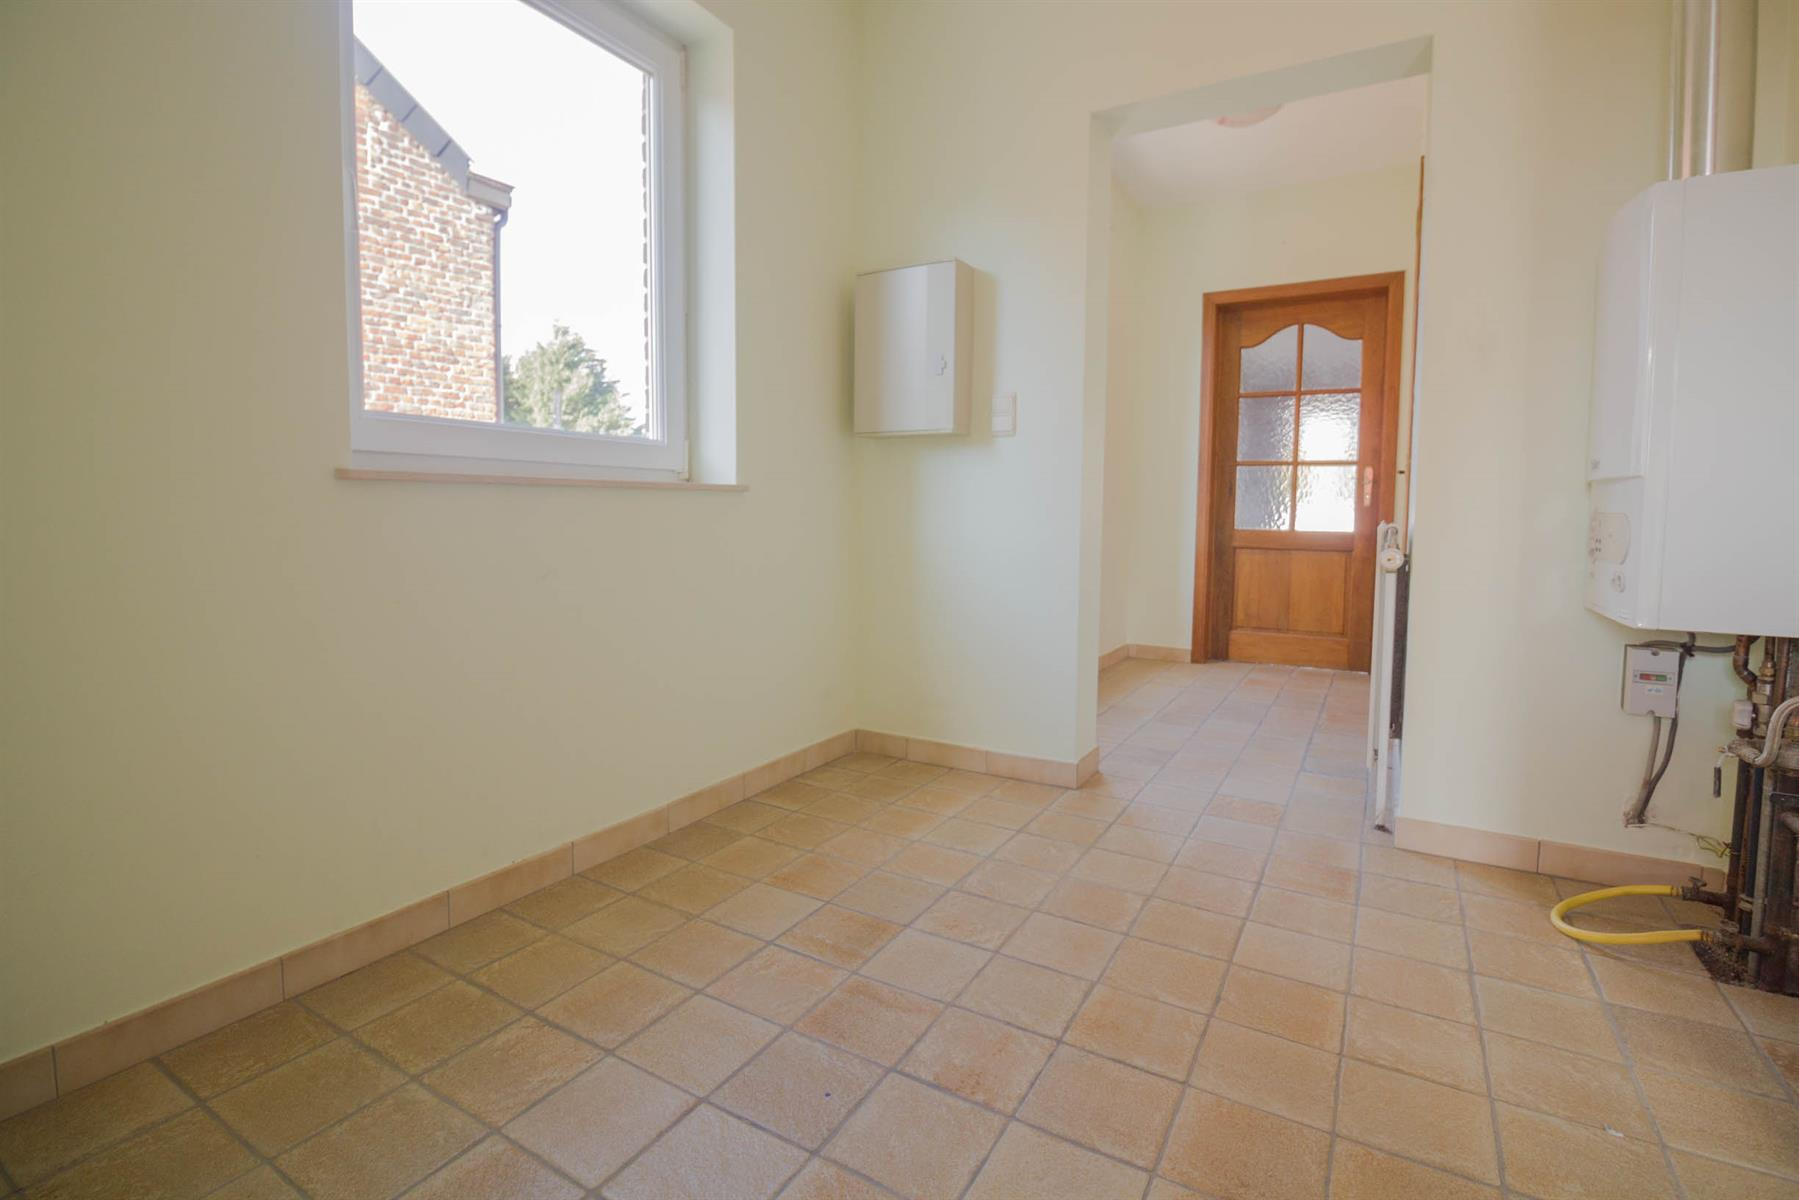 Appartement - Courcelles - #4226901-5